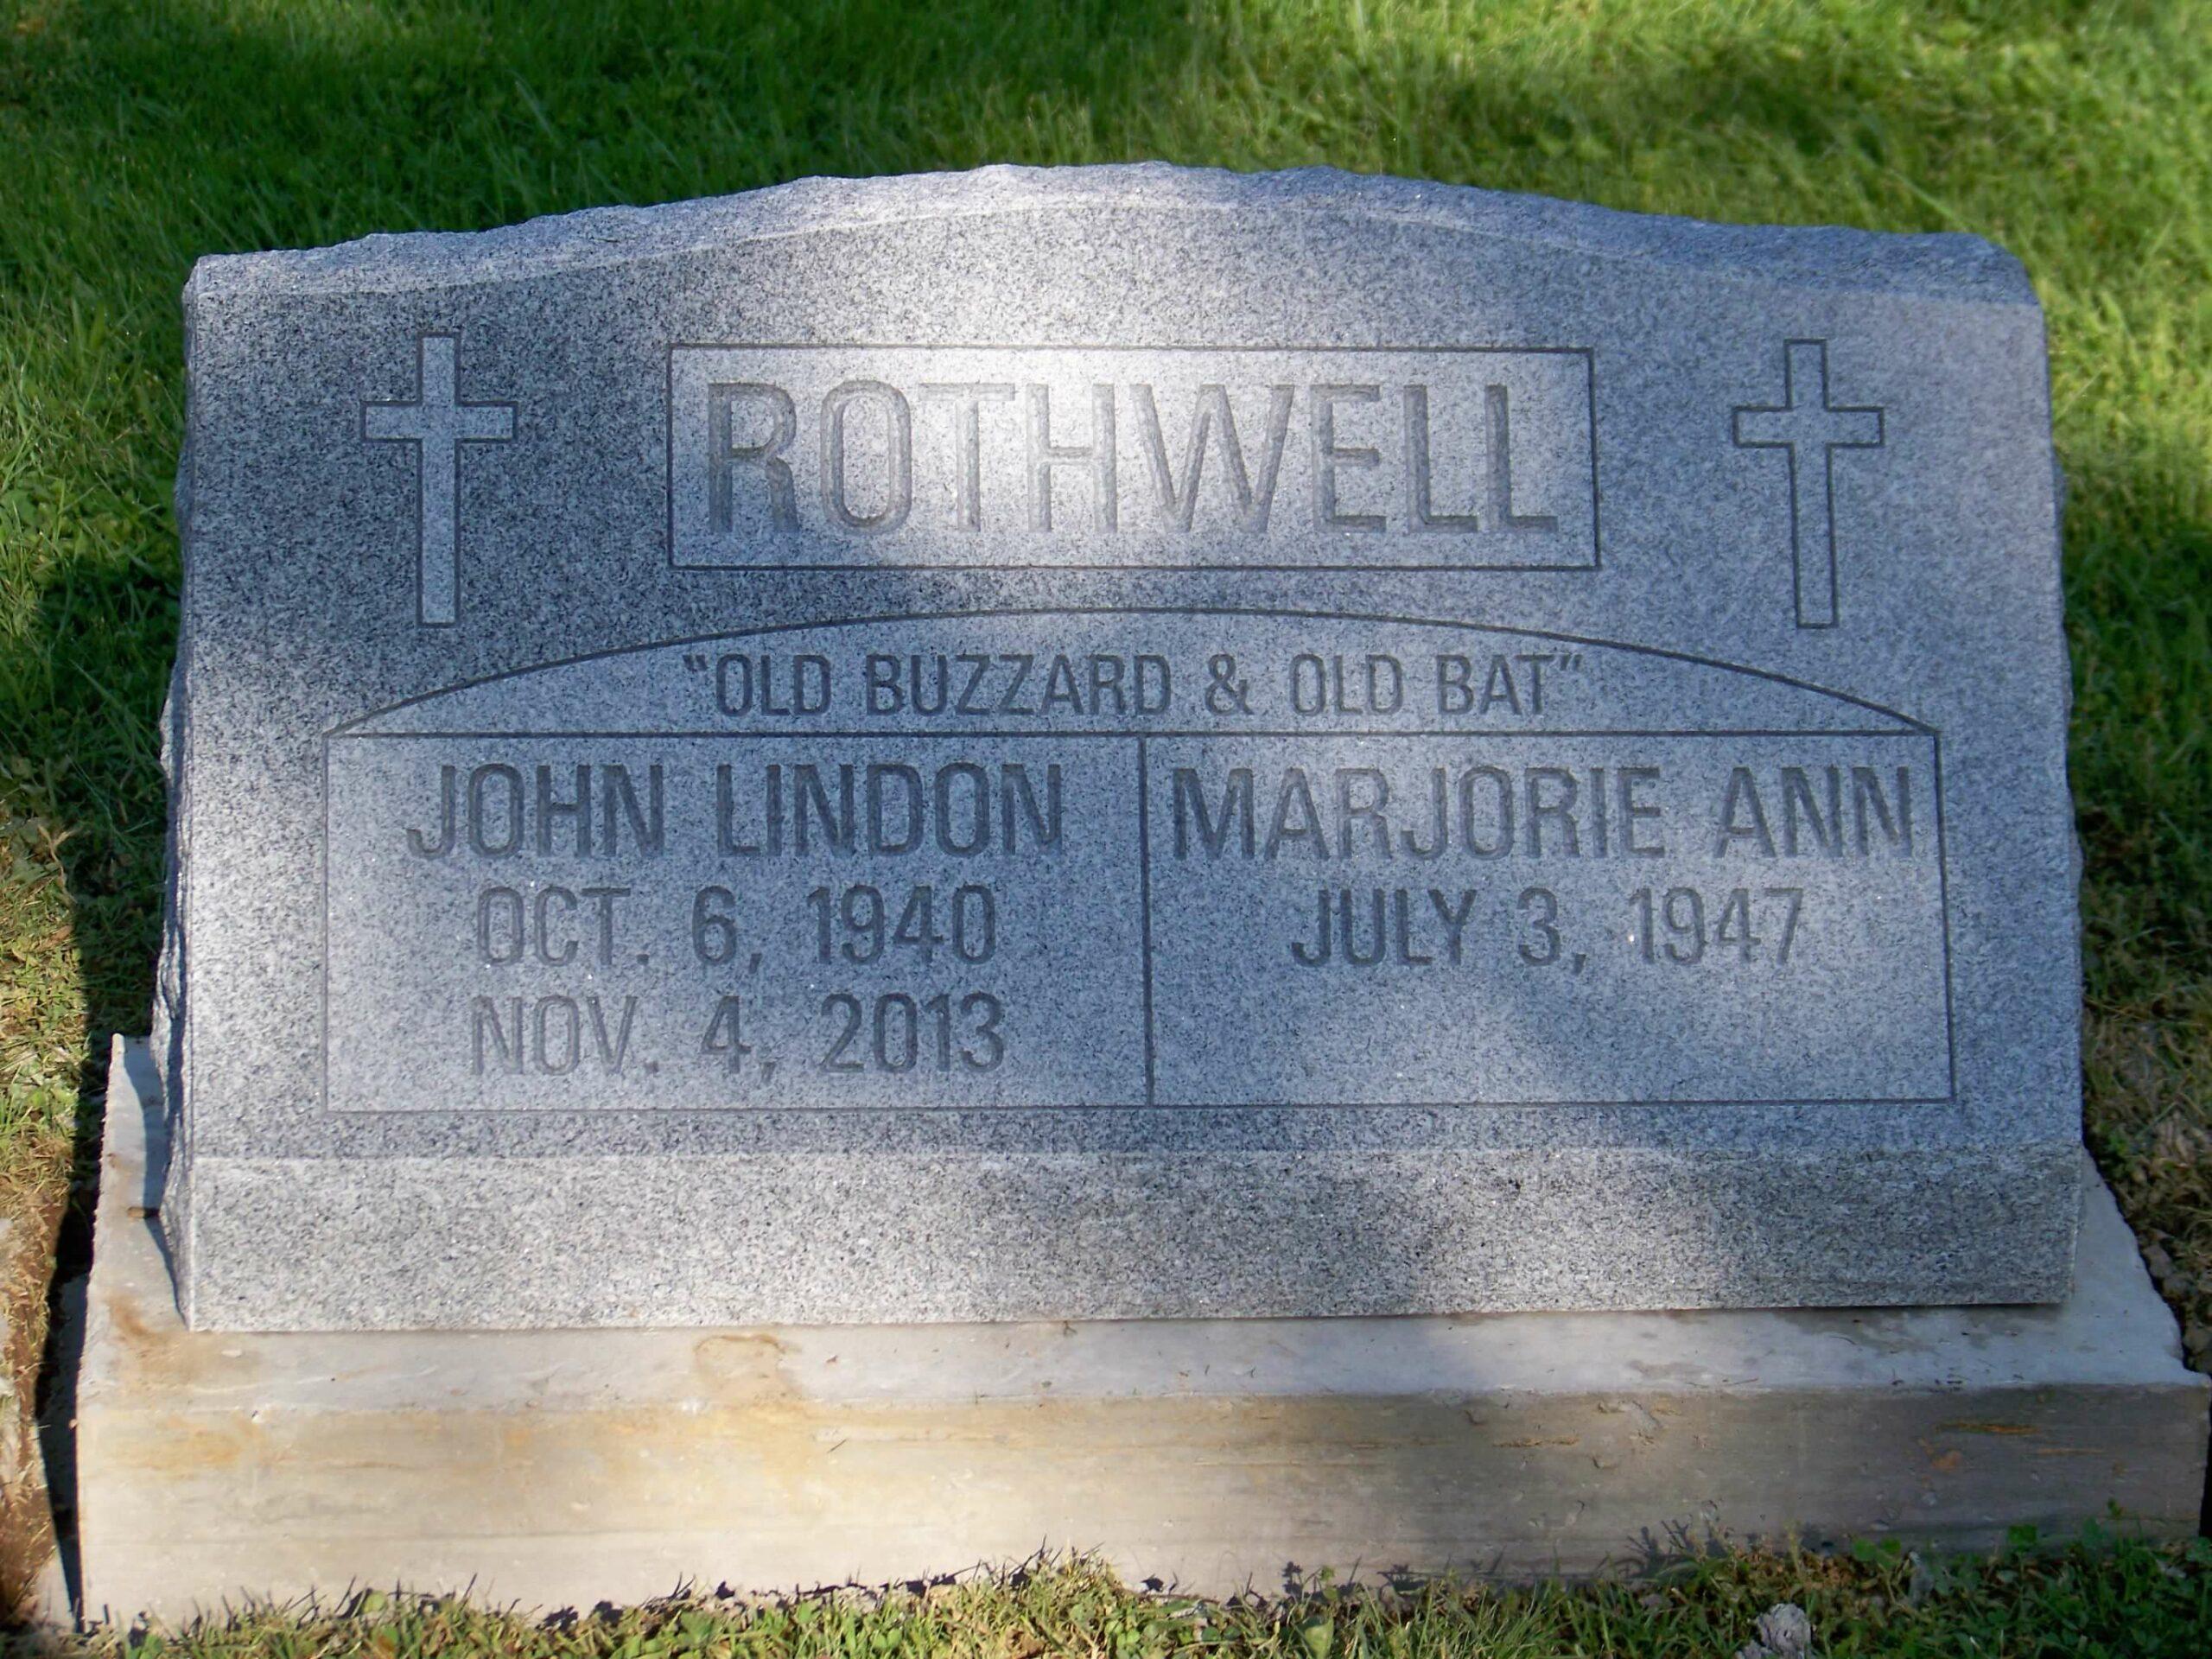 Rothwell, John Lindon